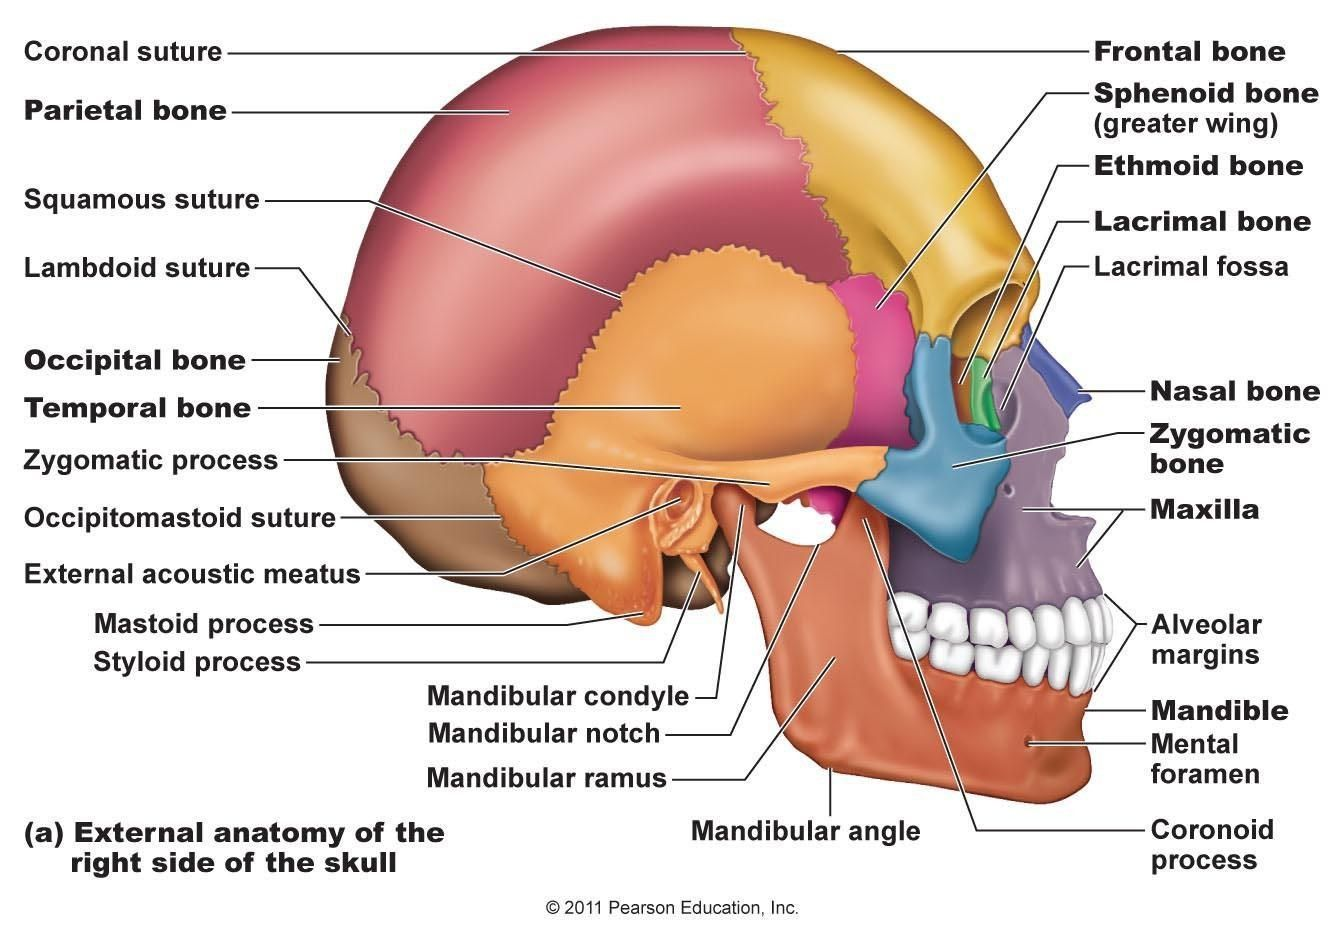 medium resolution of ethmoid bone diagram ethmoid bone diagram diagram of the skull bones diagram of the skull